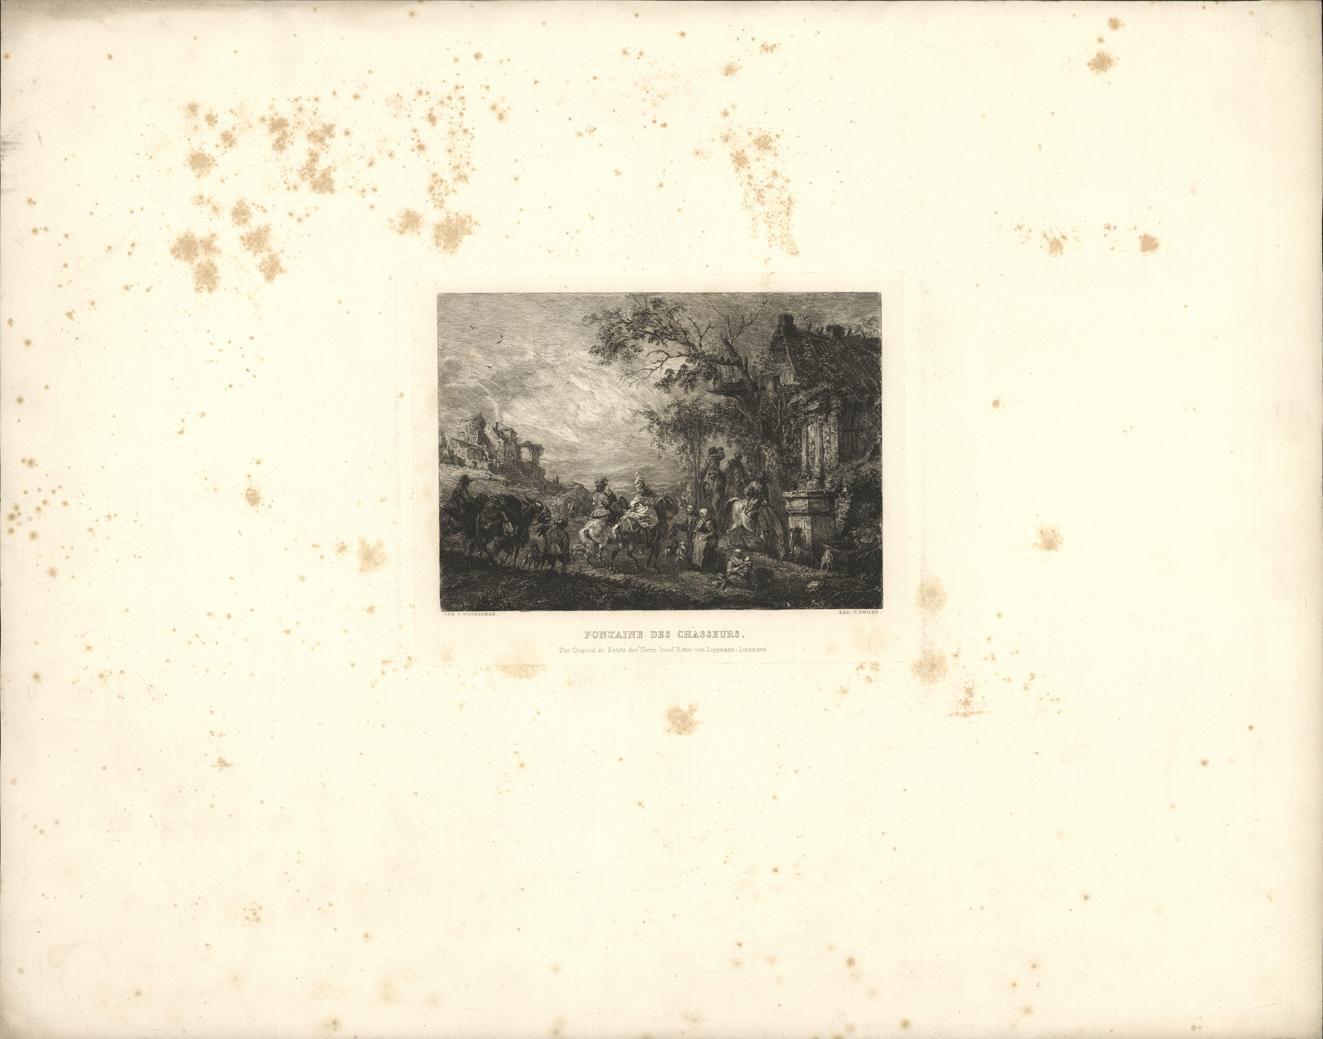 Fontaine des Chasseurs